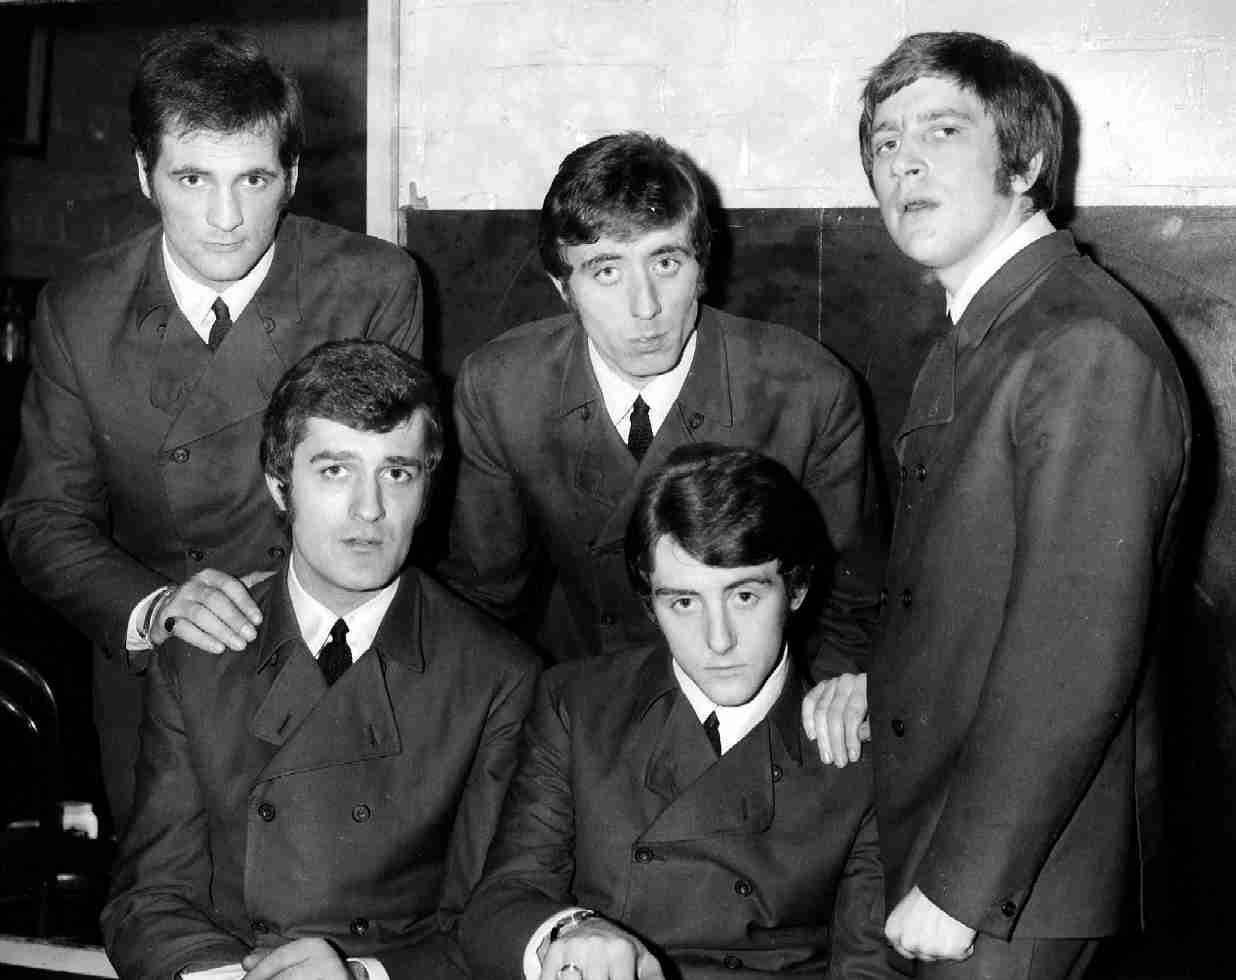 Moody Blues, Stockton on Tees, England 1965